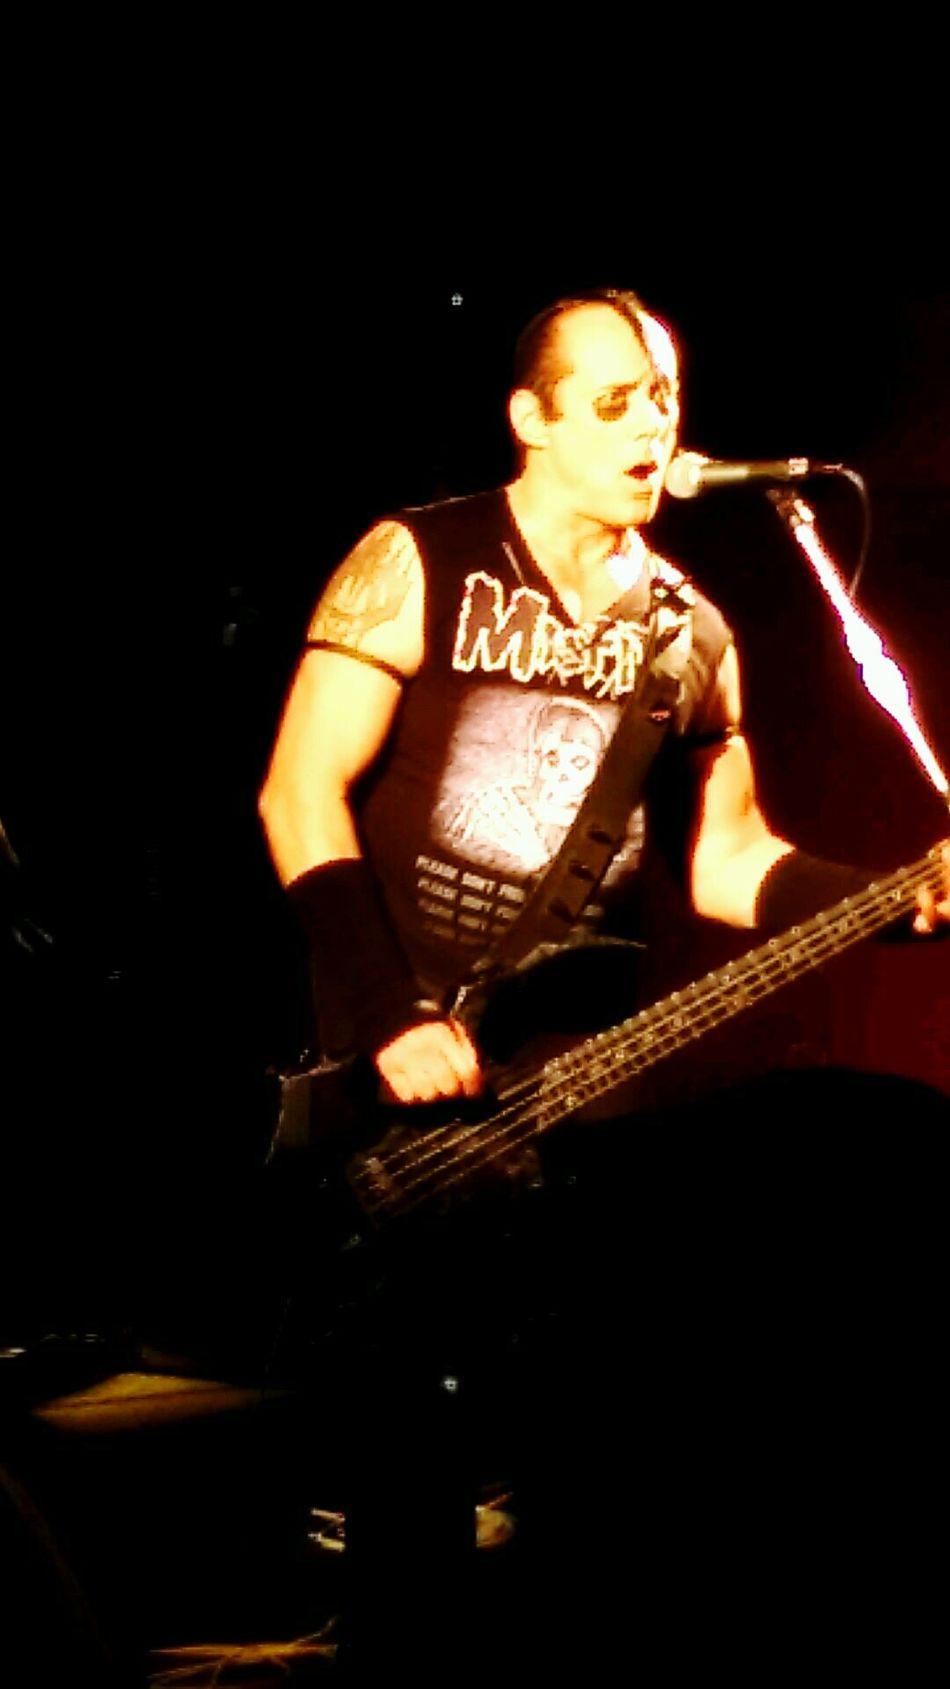 Misfits Jerryonly Live Music Punk Punkrock